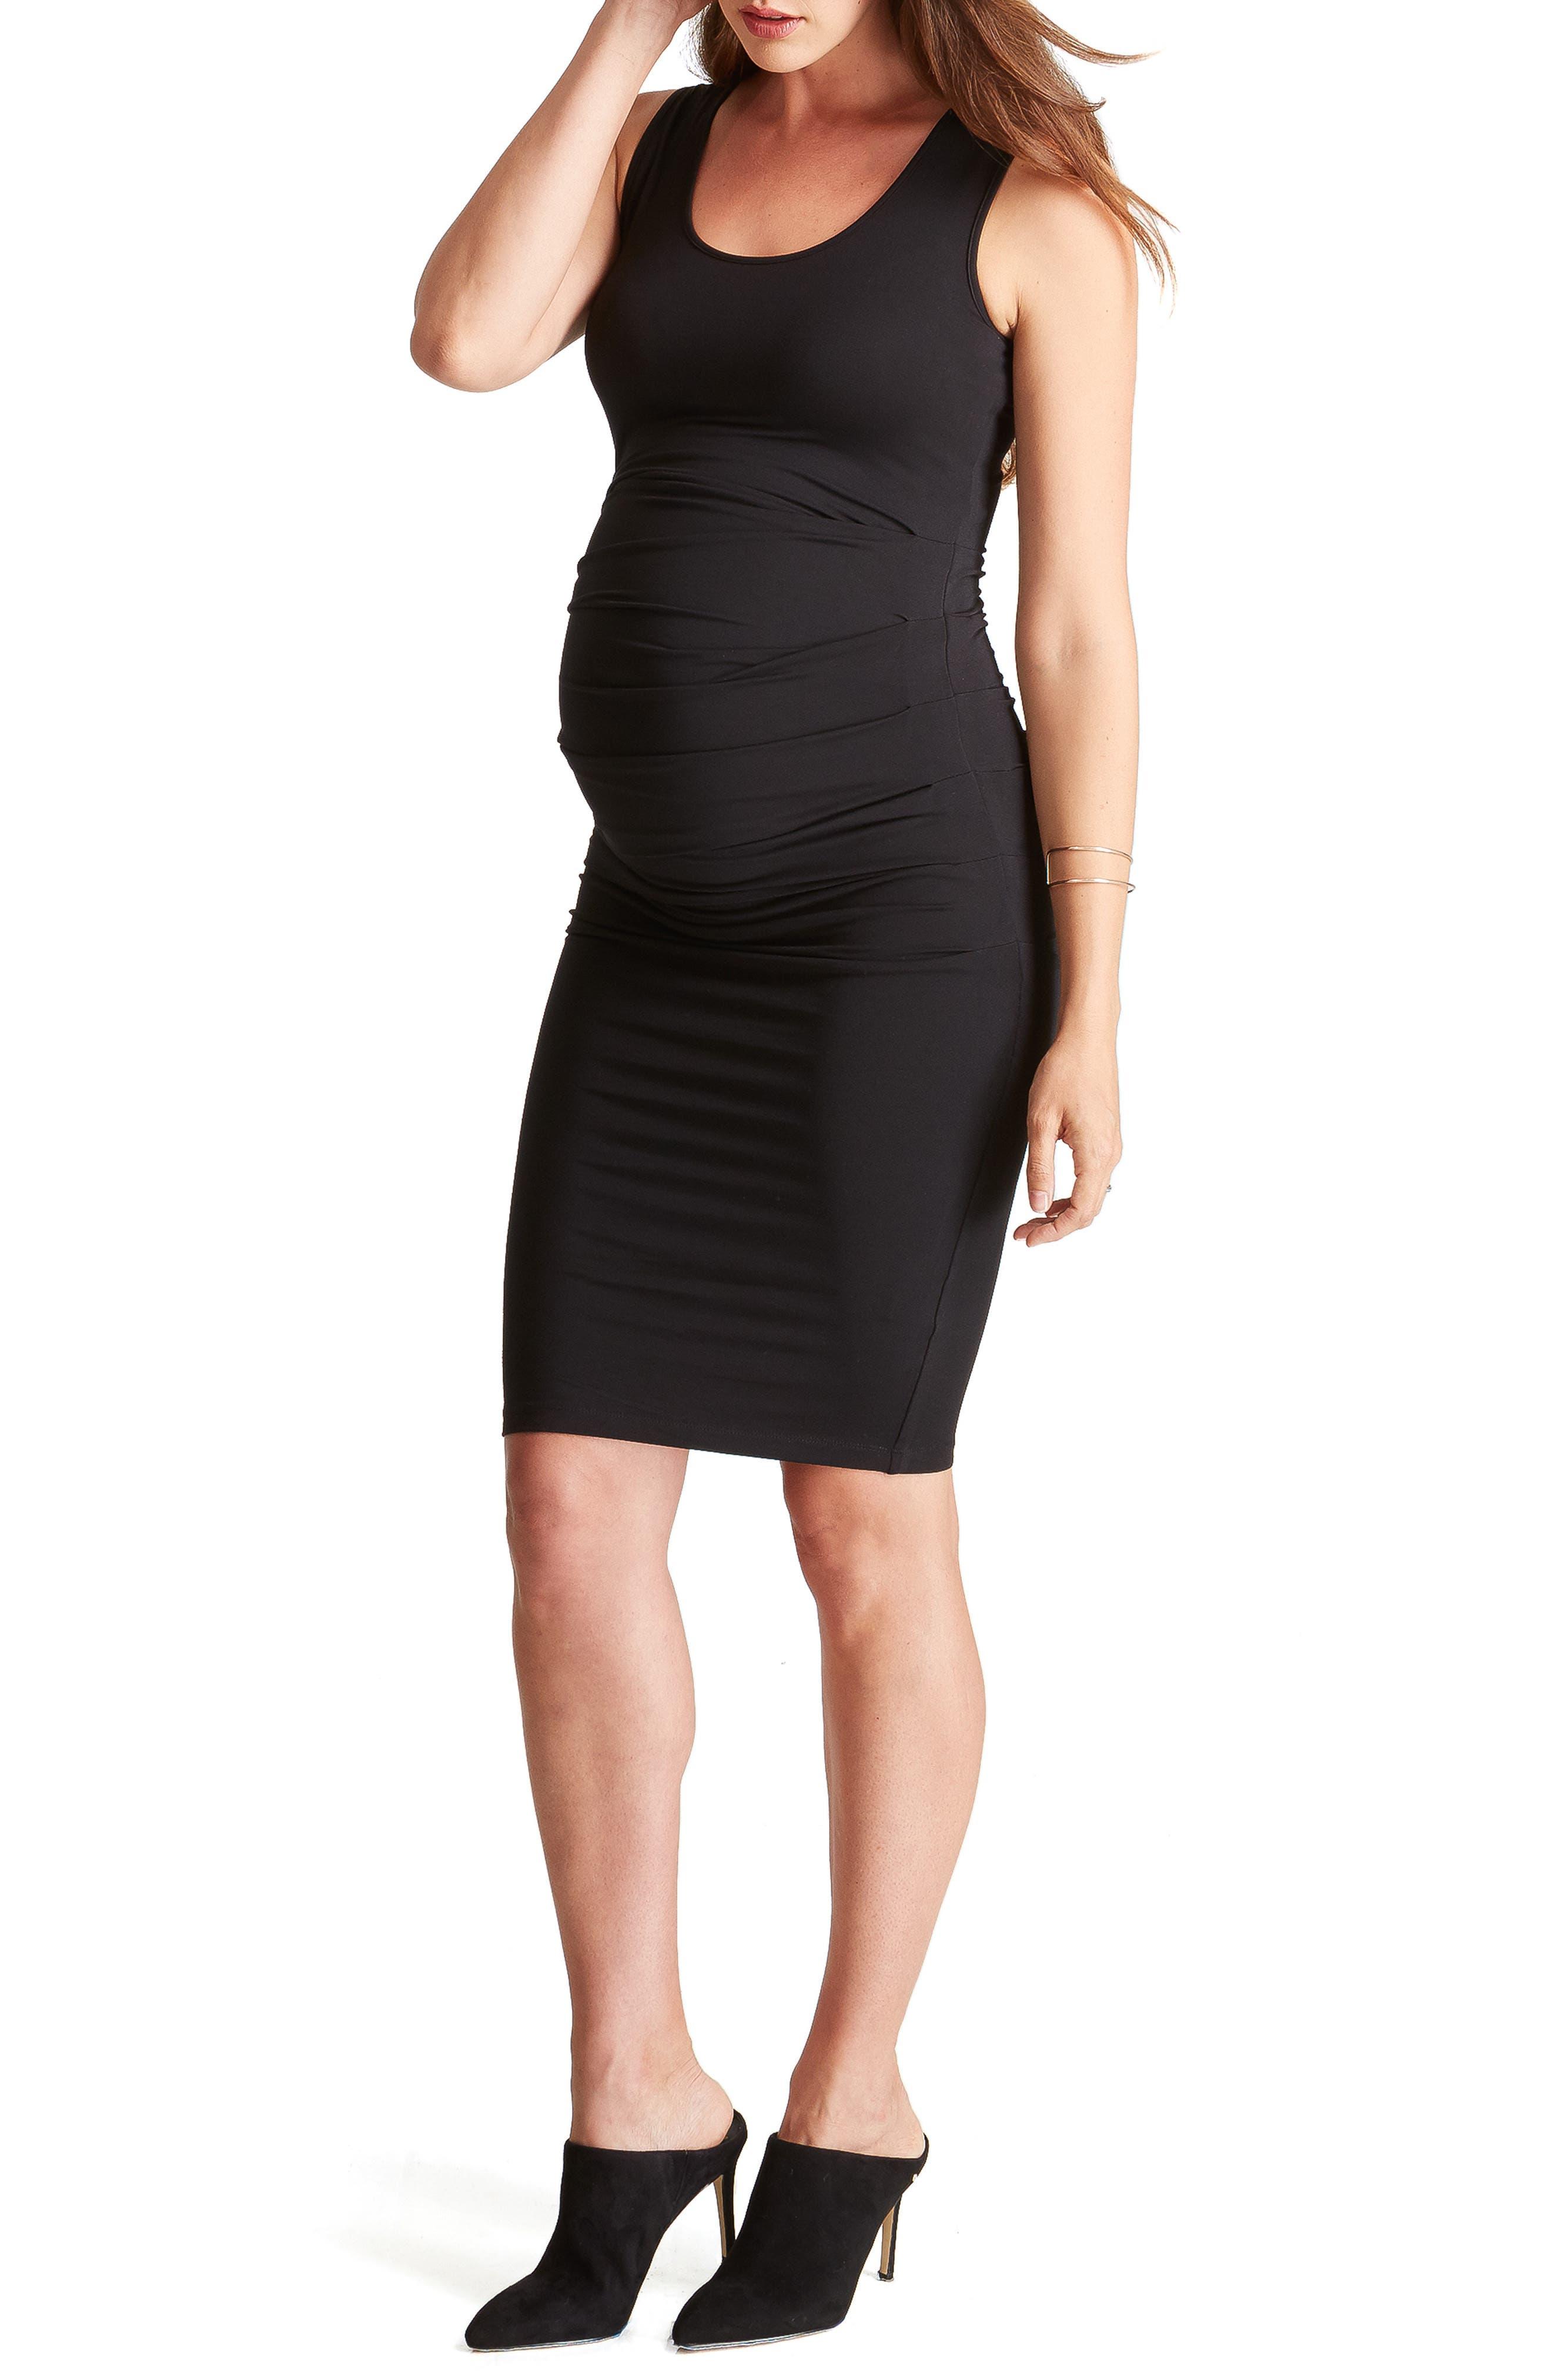 Ingrid & Isabel Ruched Maternity Tank Dress, Black